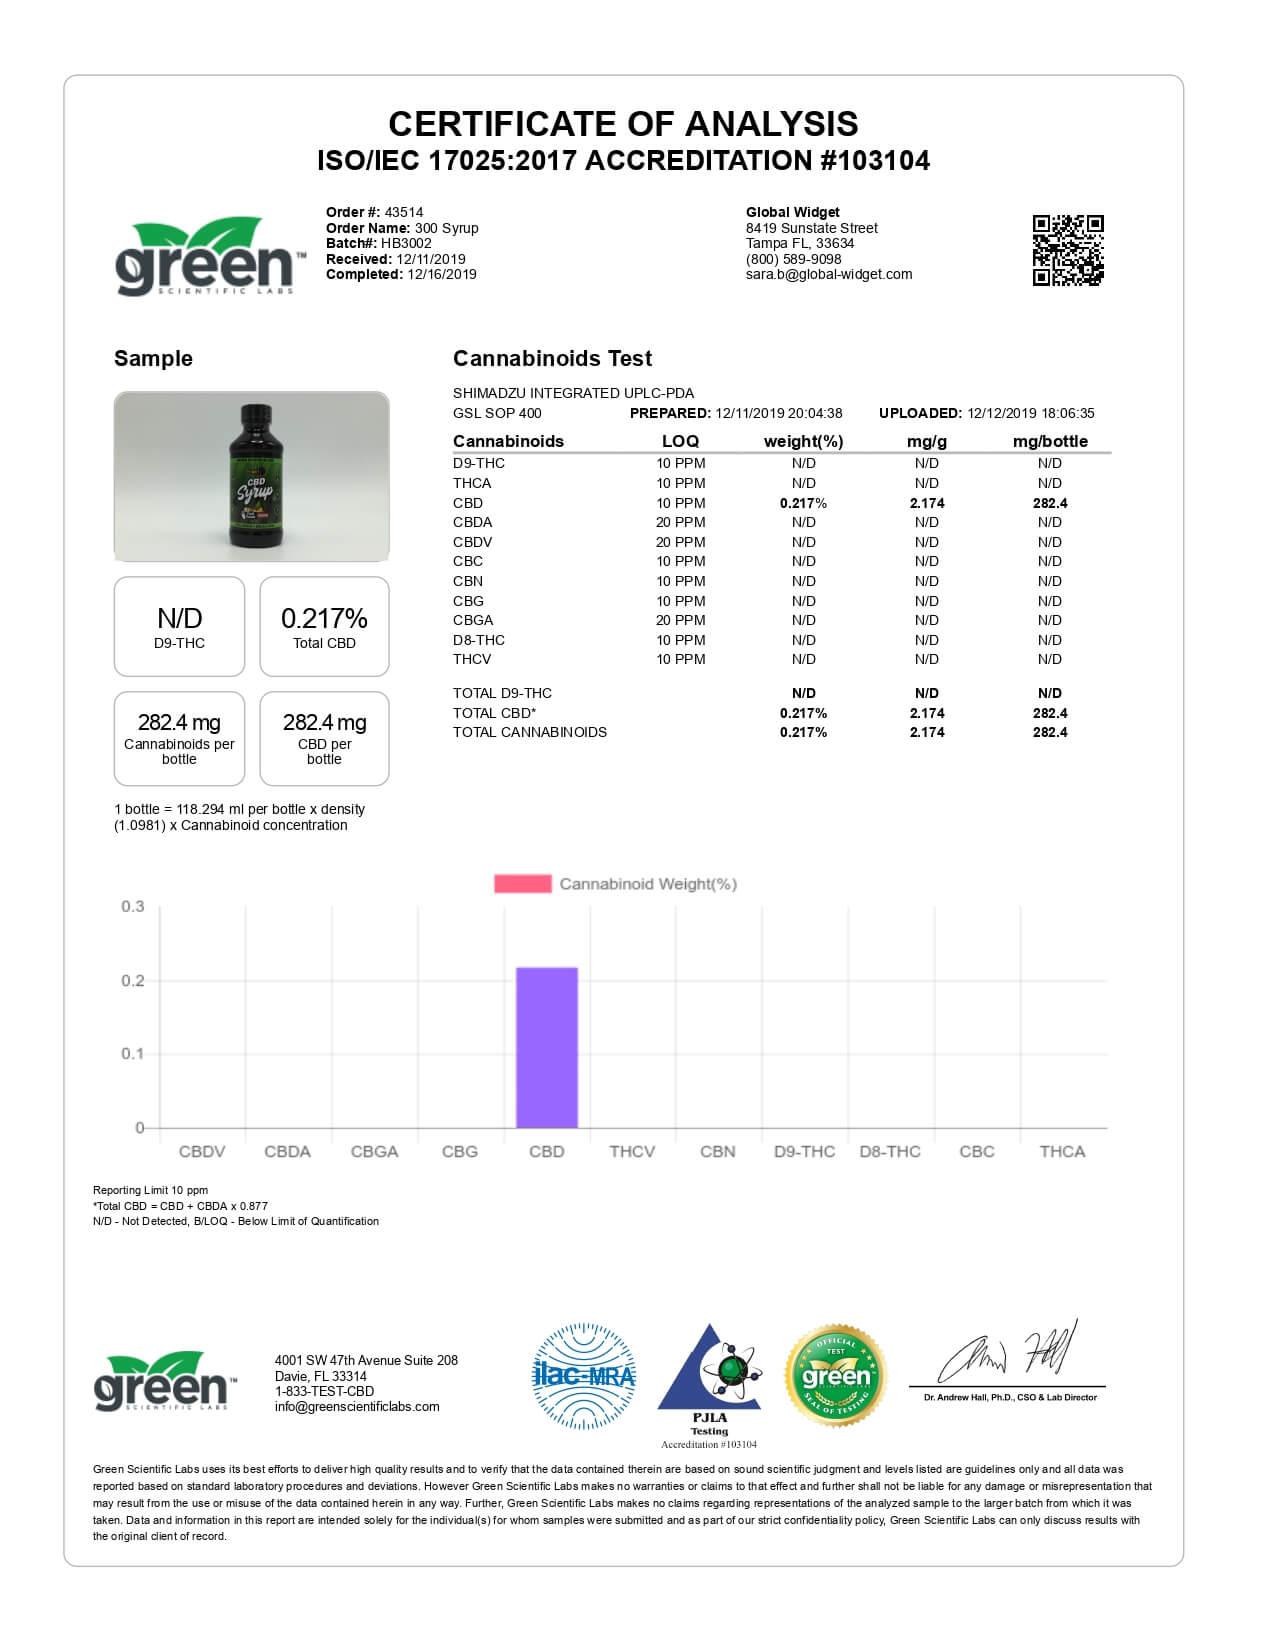 Hemp Bombs CBD Drink Syrup 300mg Lab Report